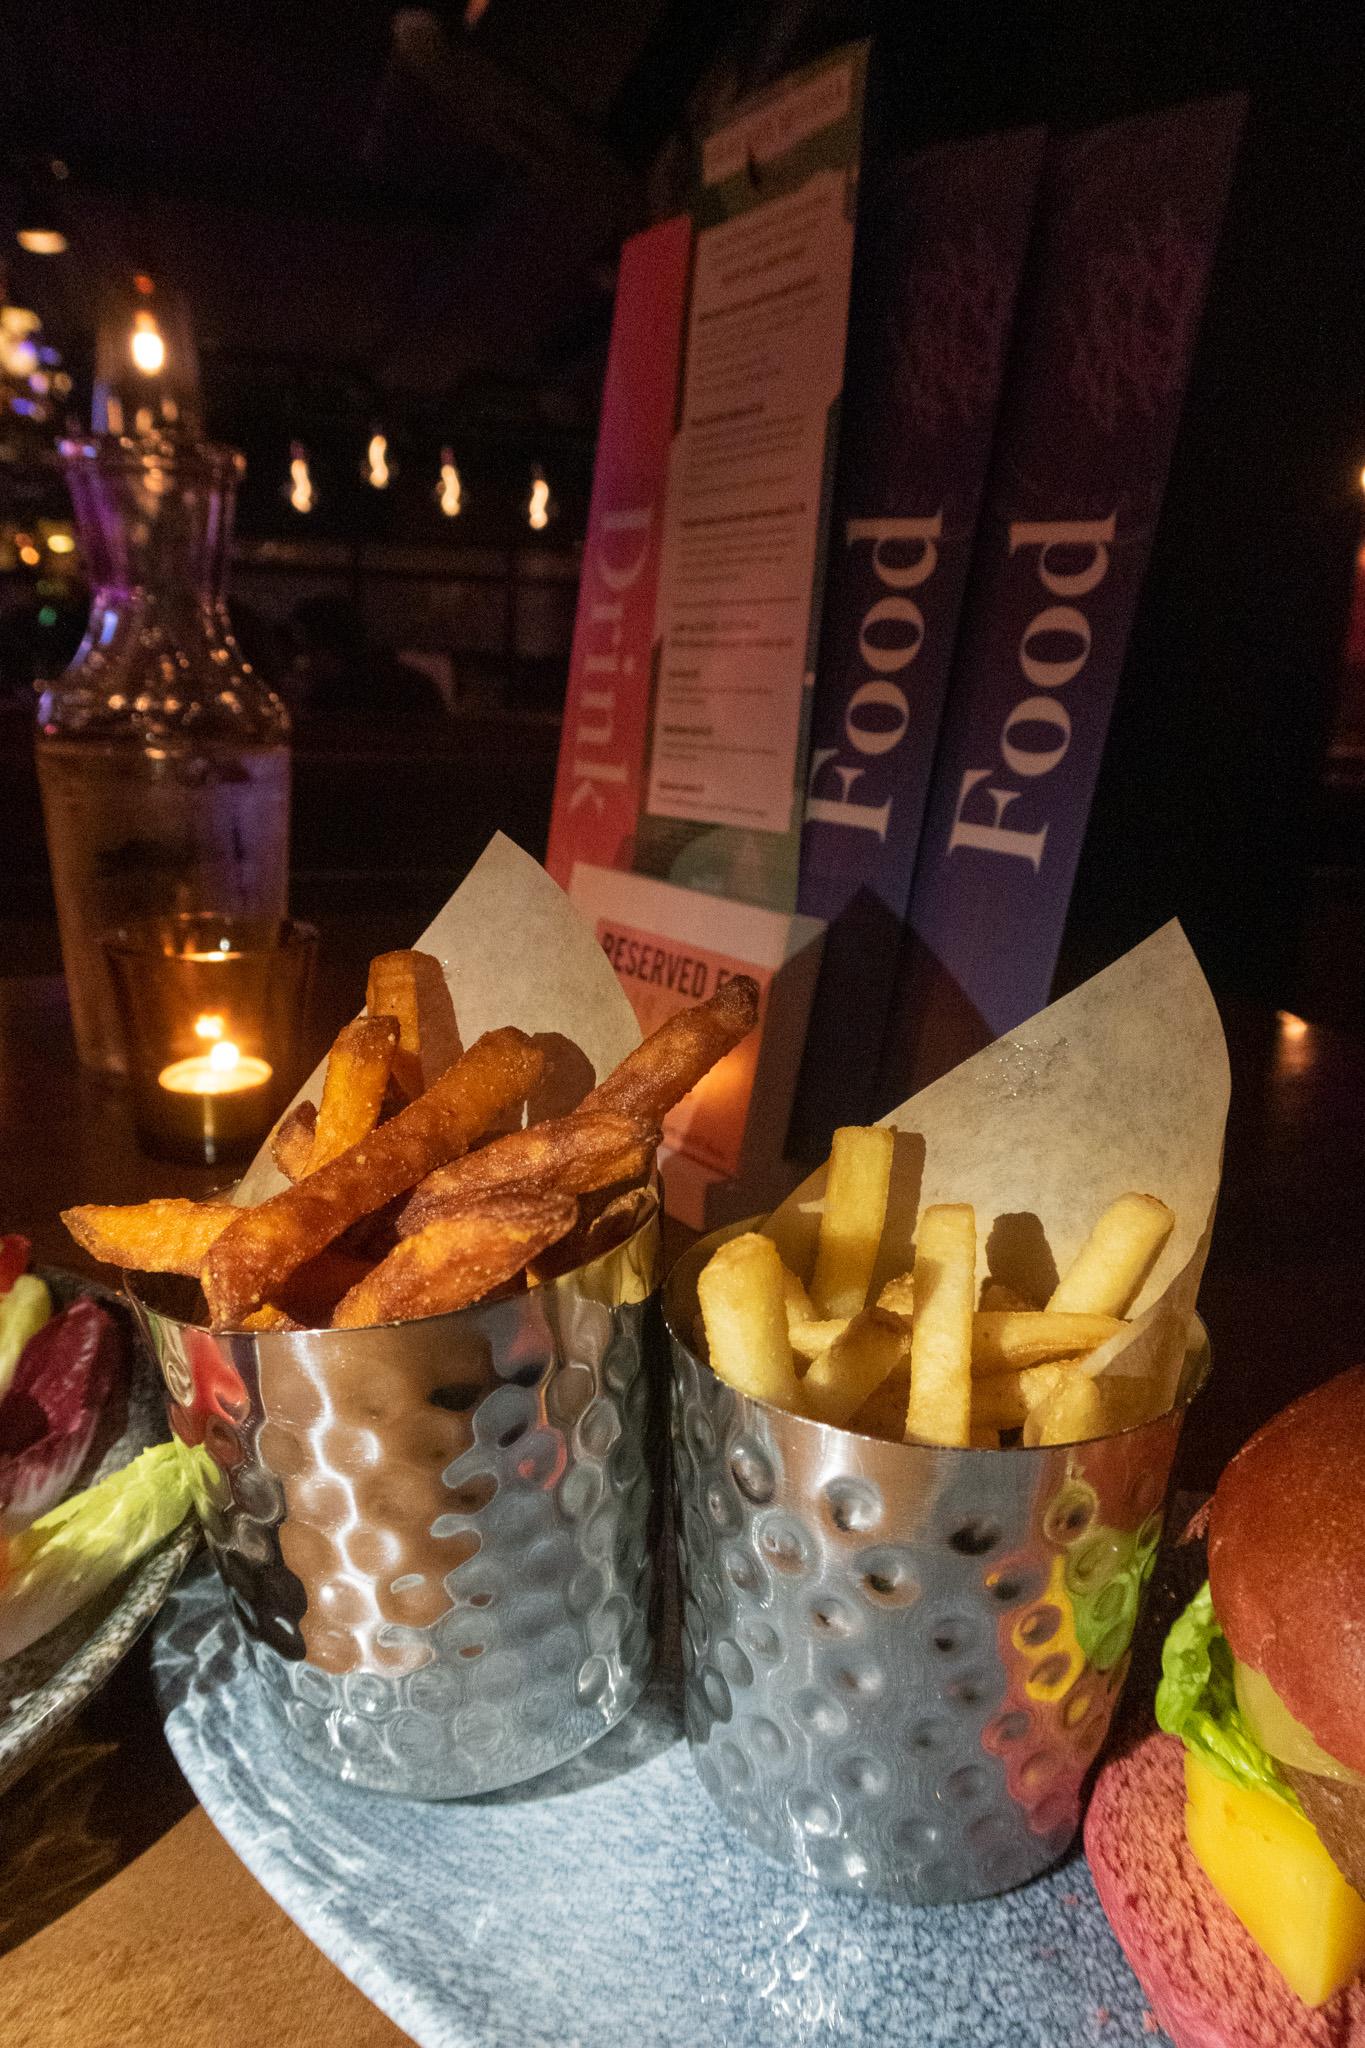 Sweet potato fries and regular fries